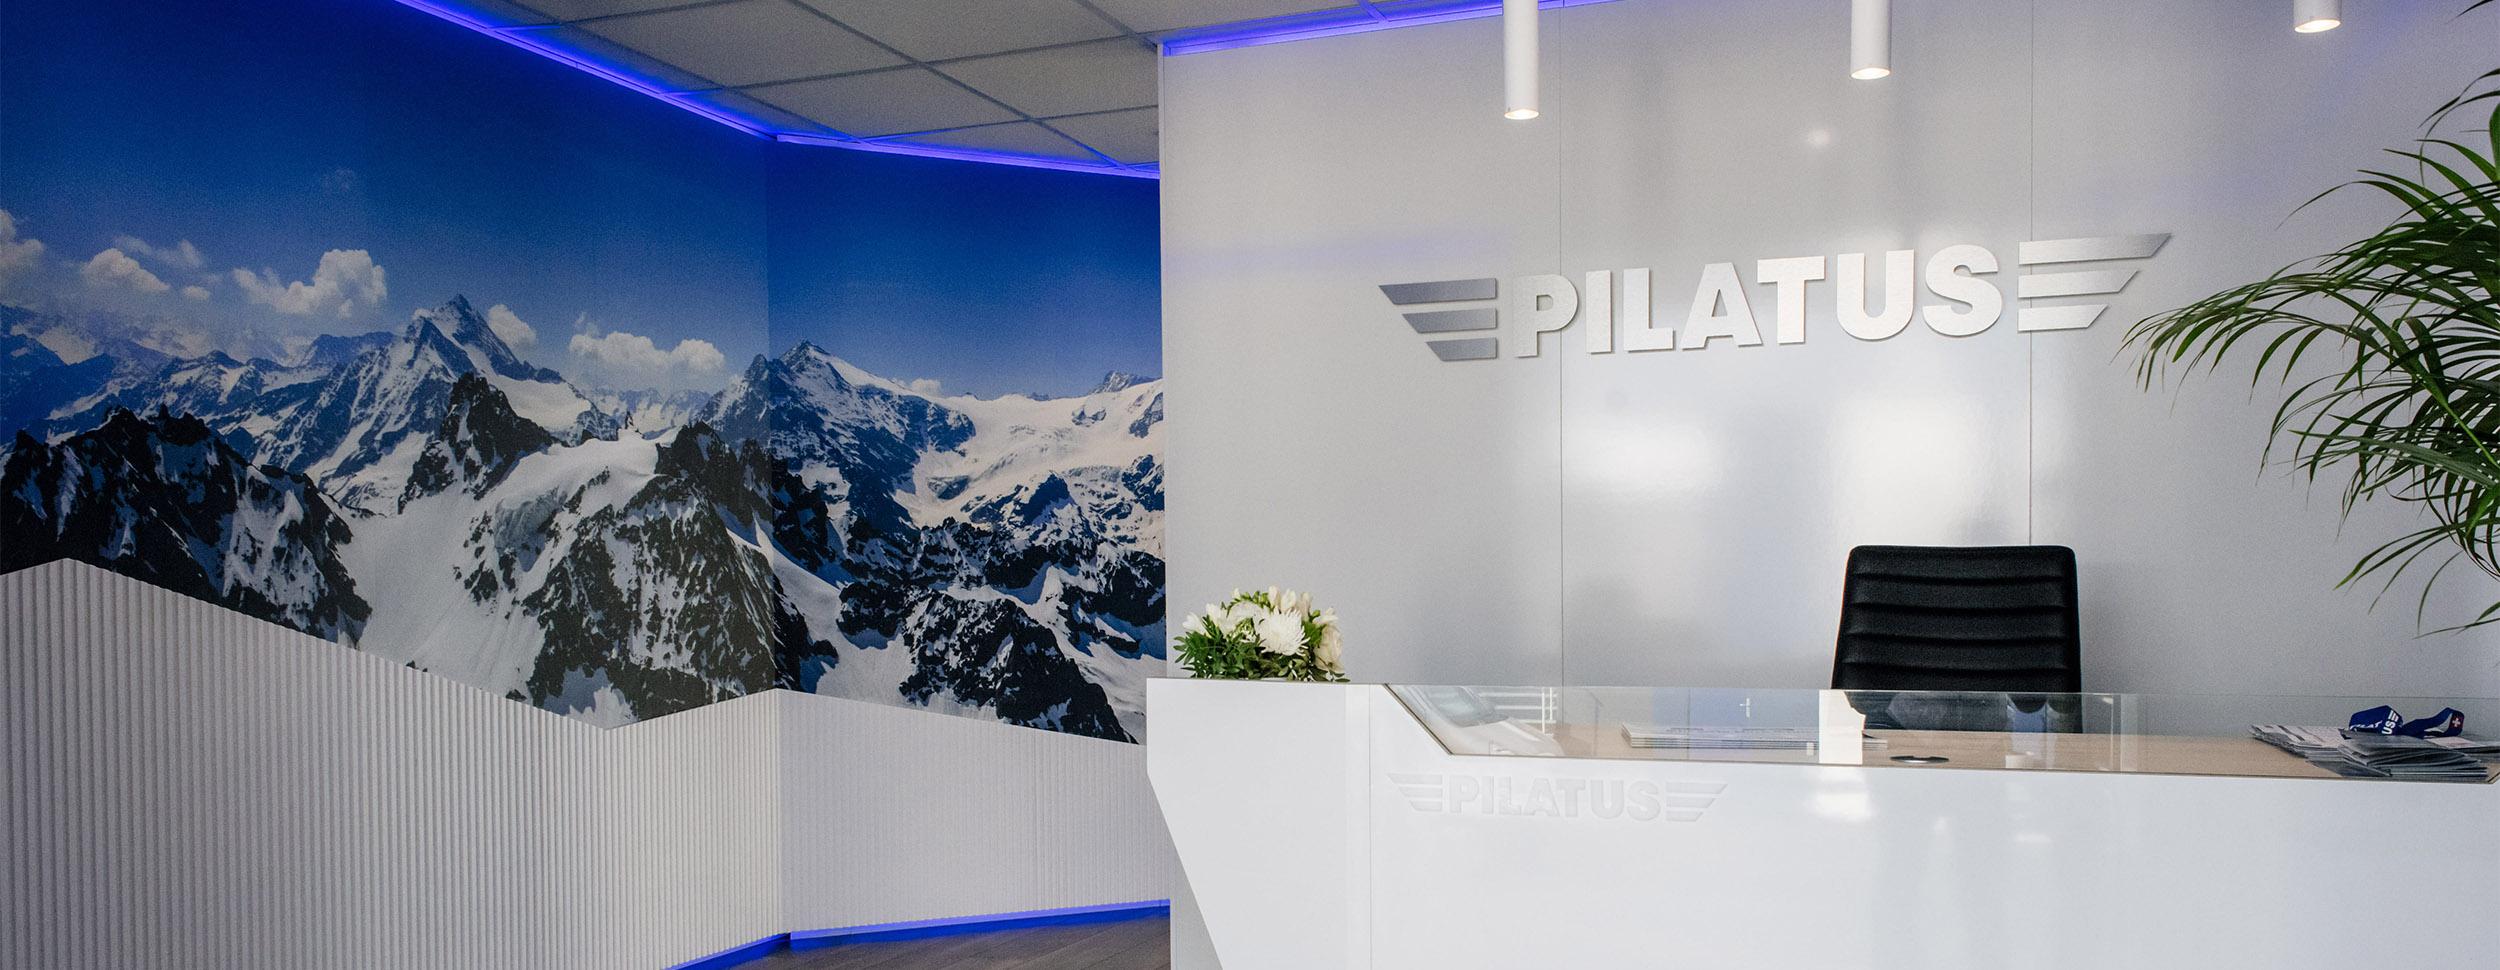 Pilatus-PAS2019-Ignition_LR.jpg